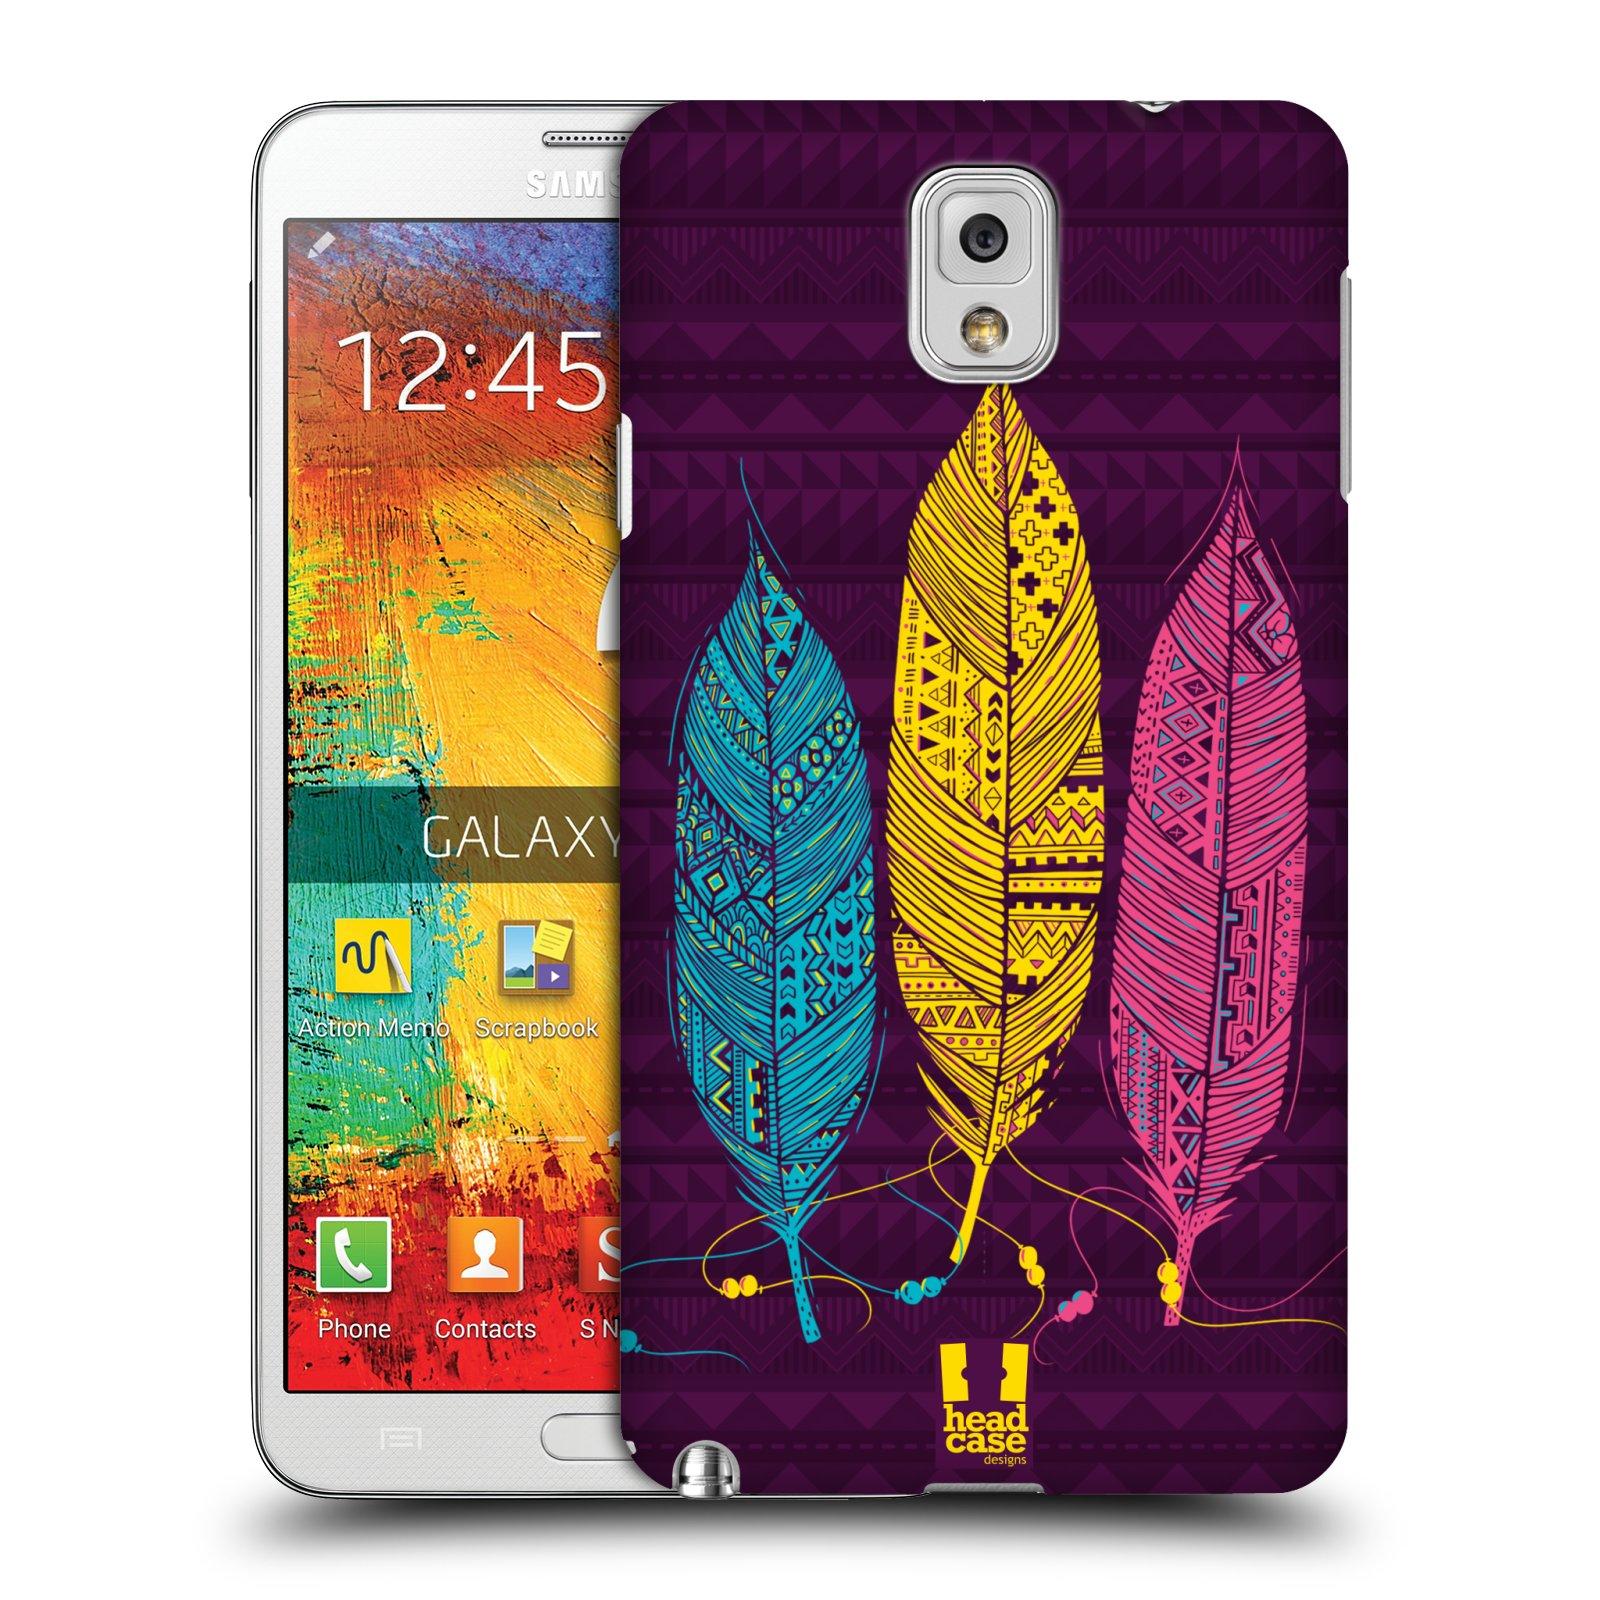 Plastové pouzdro na mobil Samsung Galaxy Note 3 HEAD CASE AZTEC PÍRKA 3 BAREV (Kryt či obal na mobilní telefon Samsung Galaxy Note 3 SM-N9005)